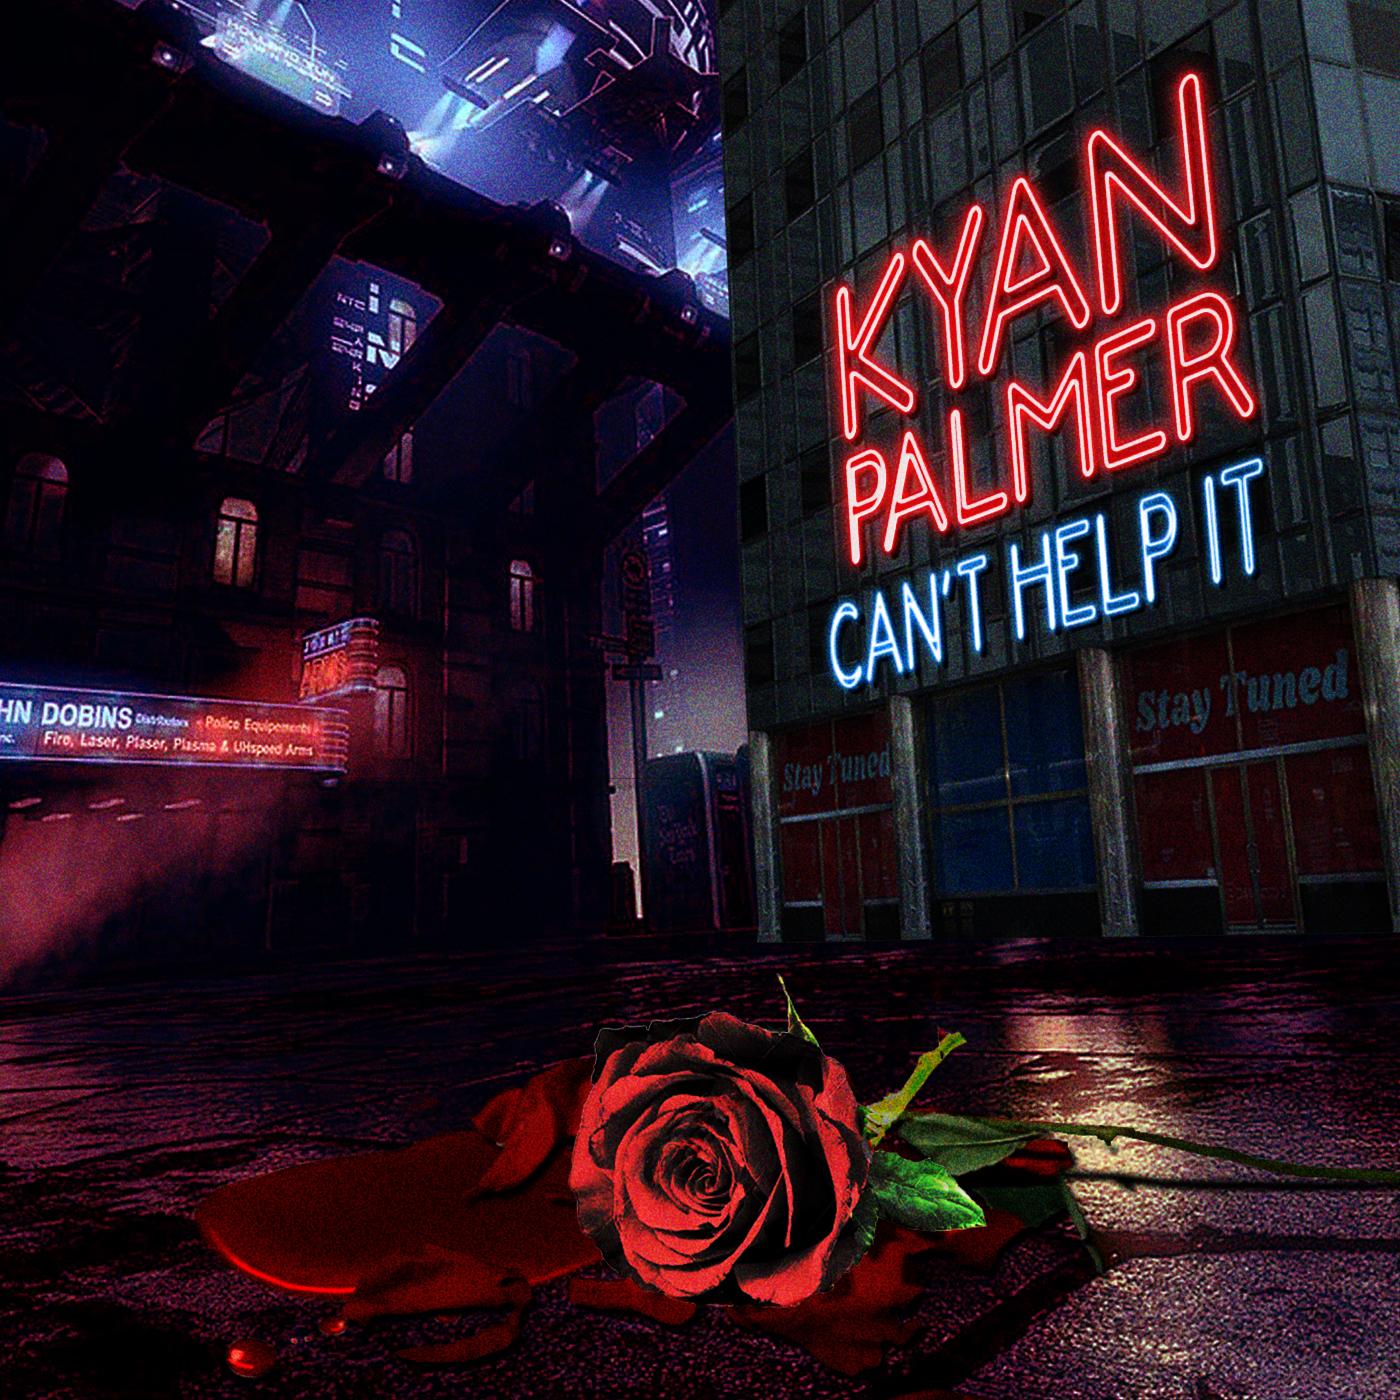 Kyan Palmer: New Single